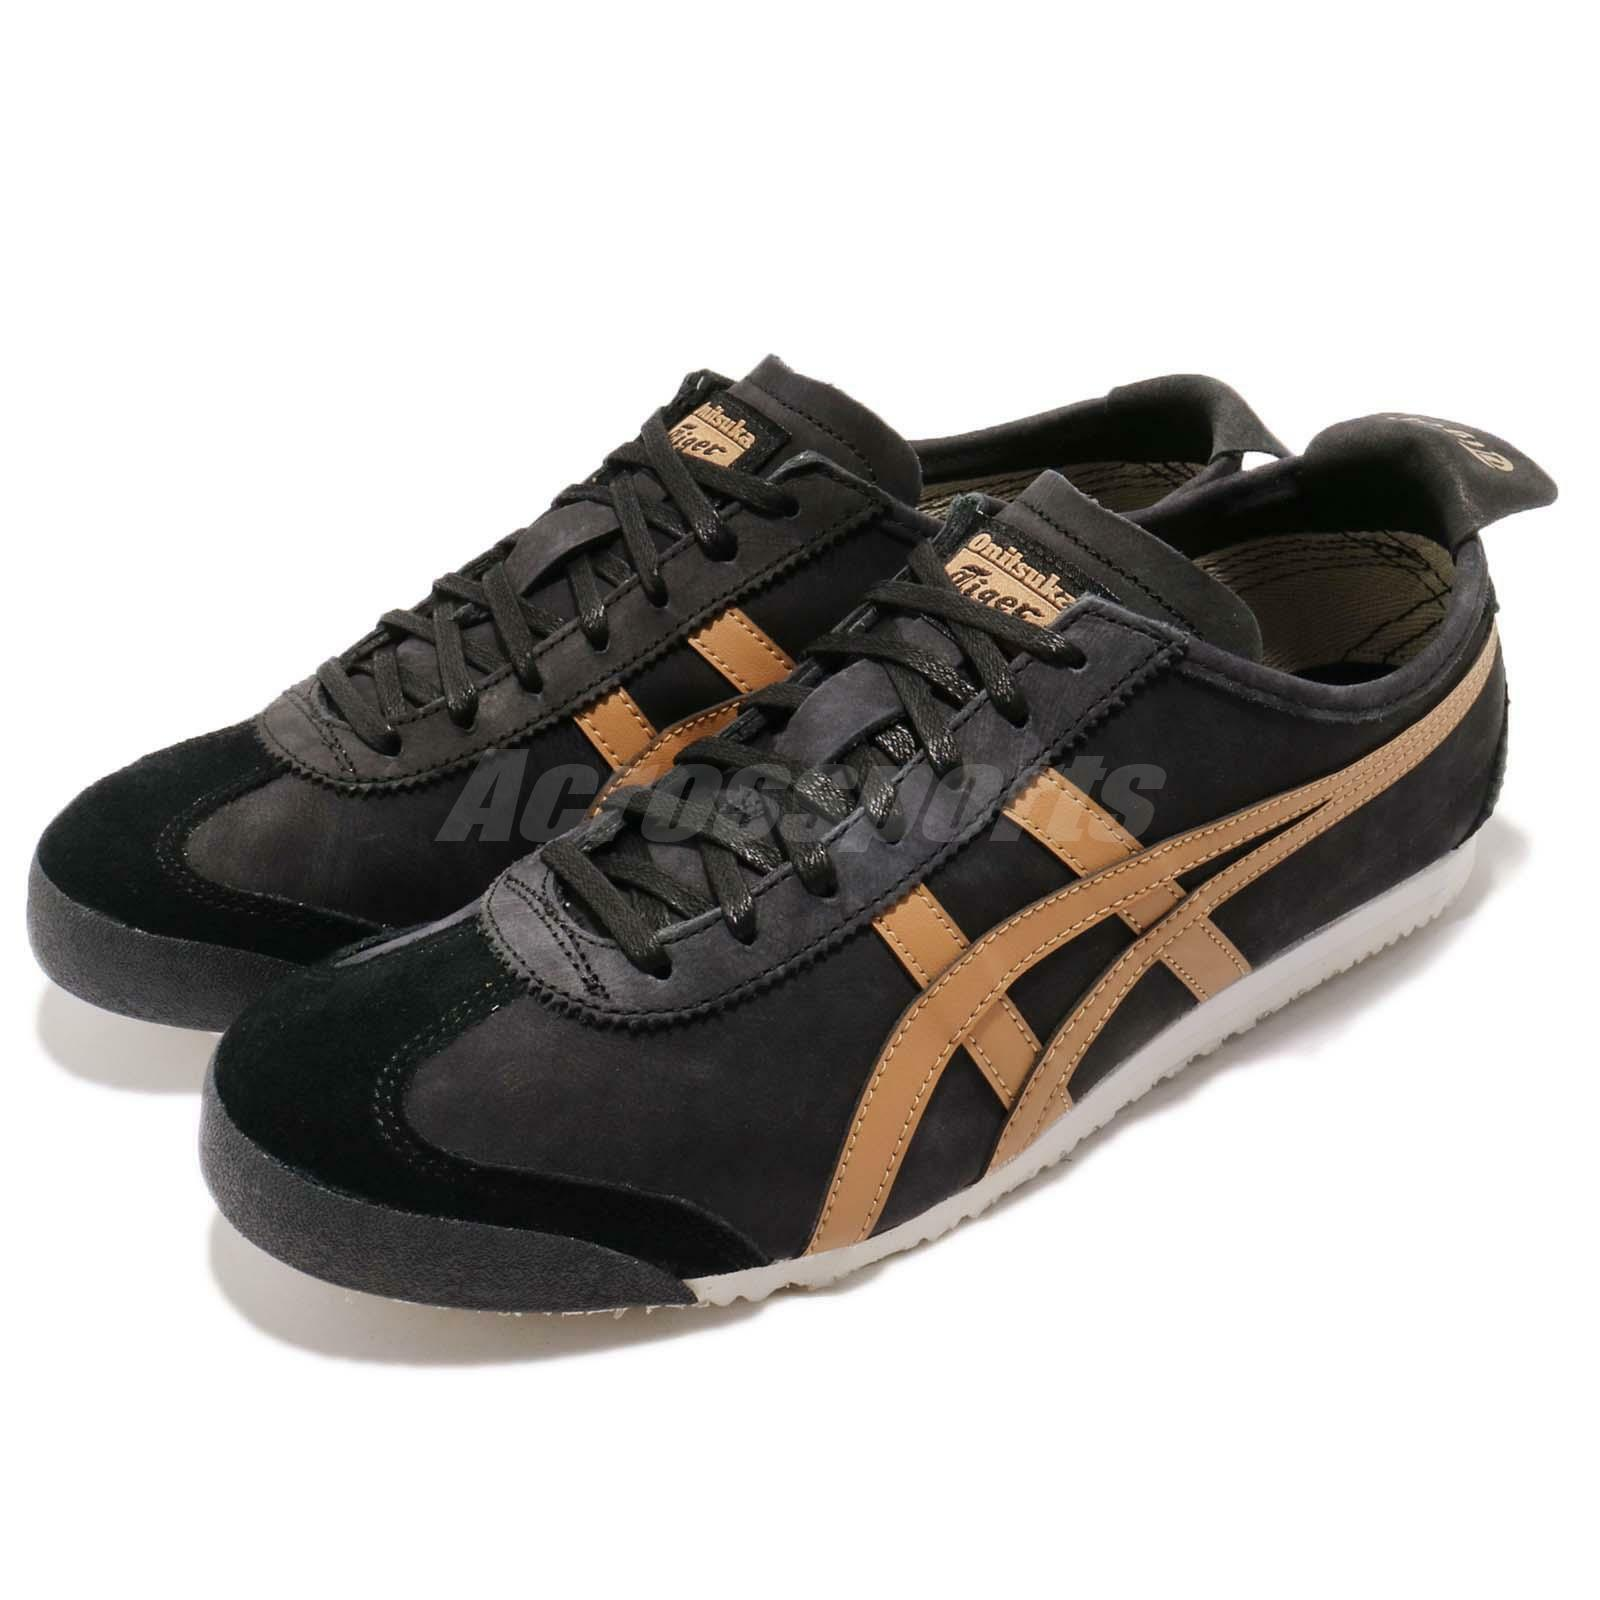 Asics Onitsuka Tiger Mexico 66 zwart bruin mannen hardlopen schoen sneaker 1183A19-8001